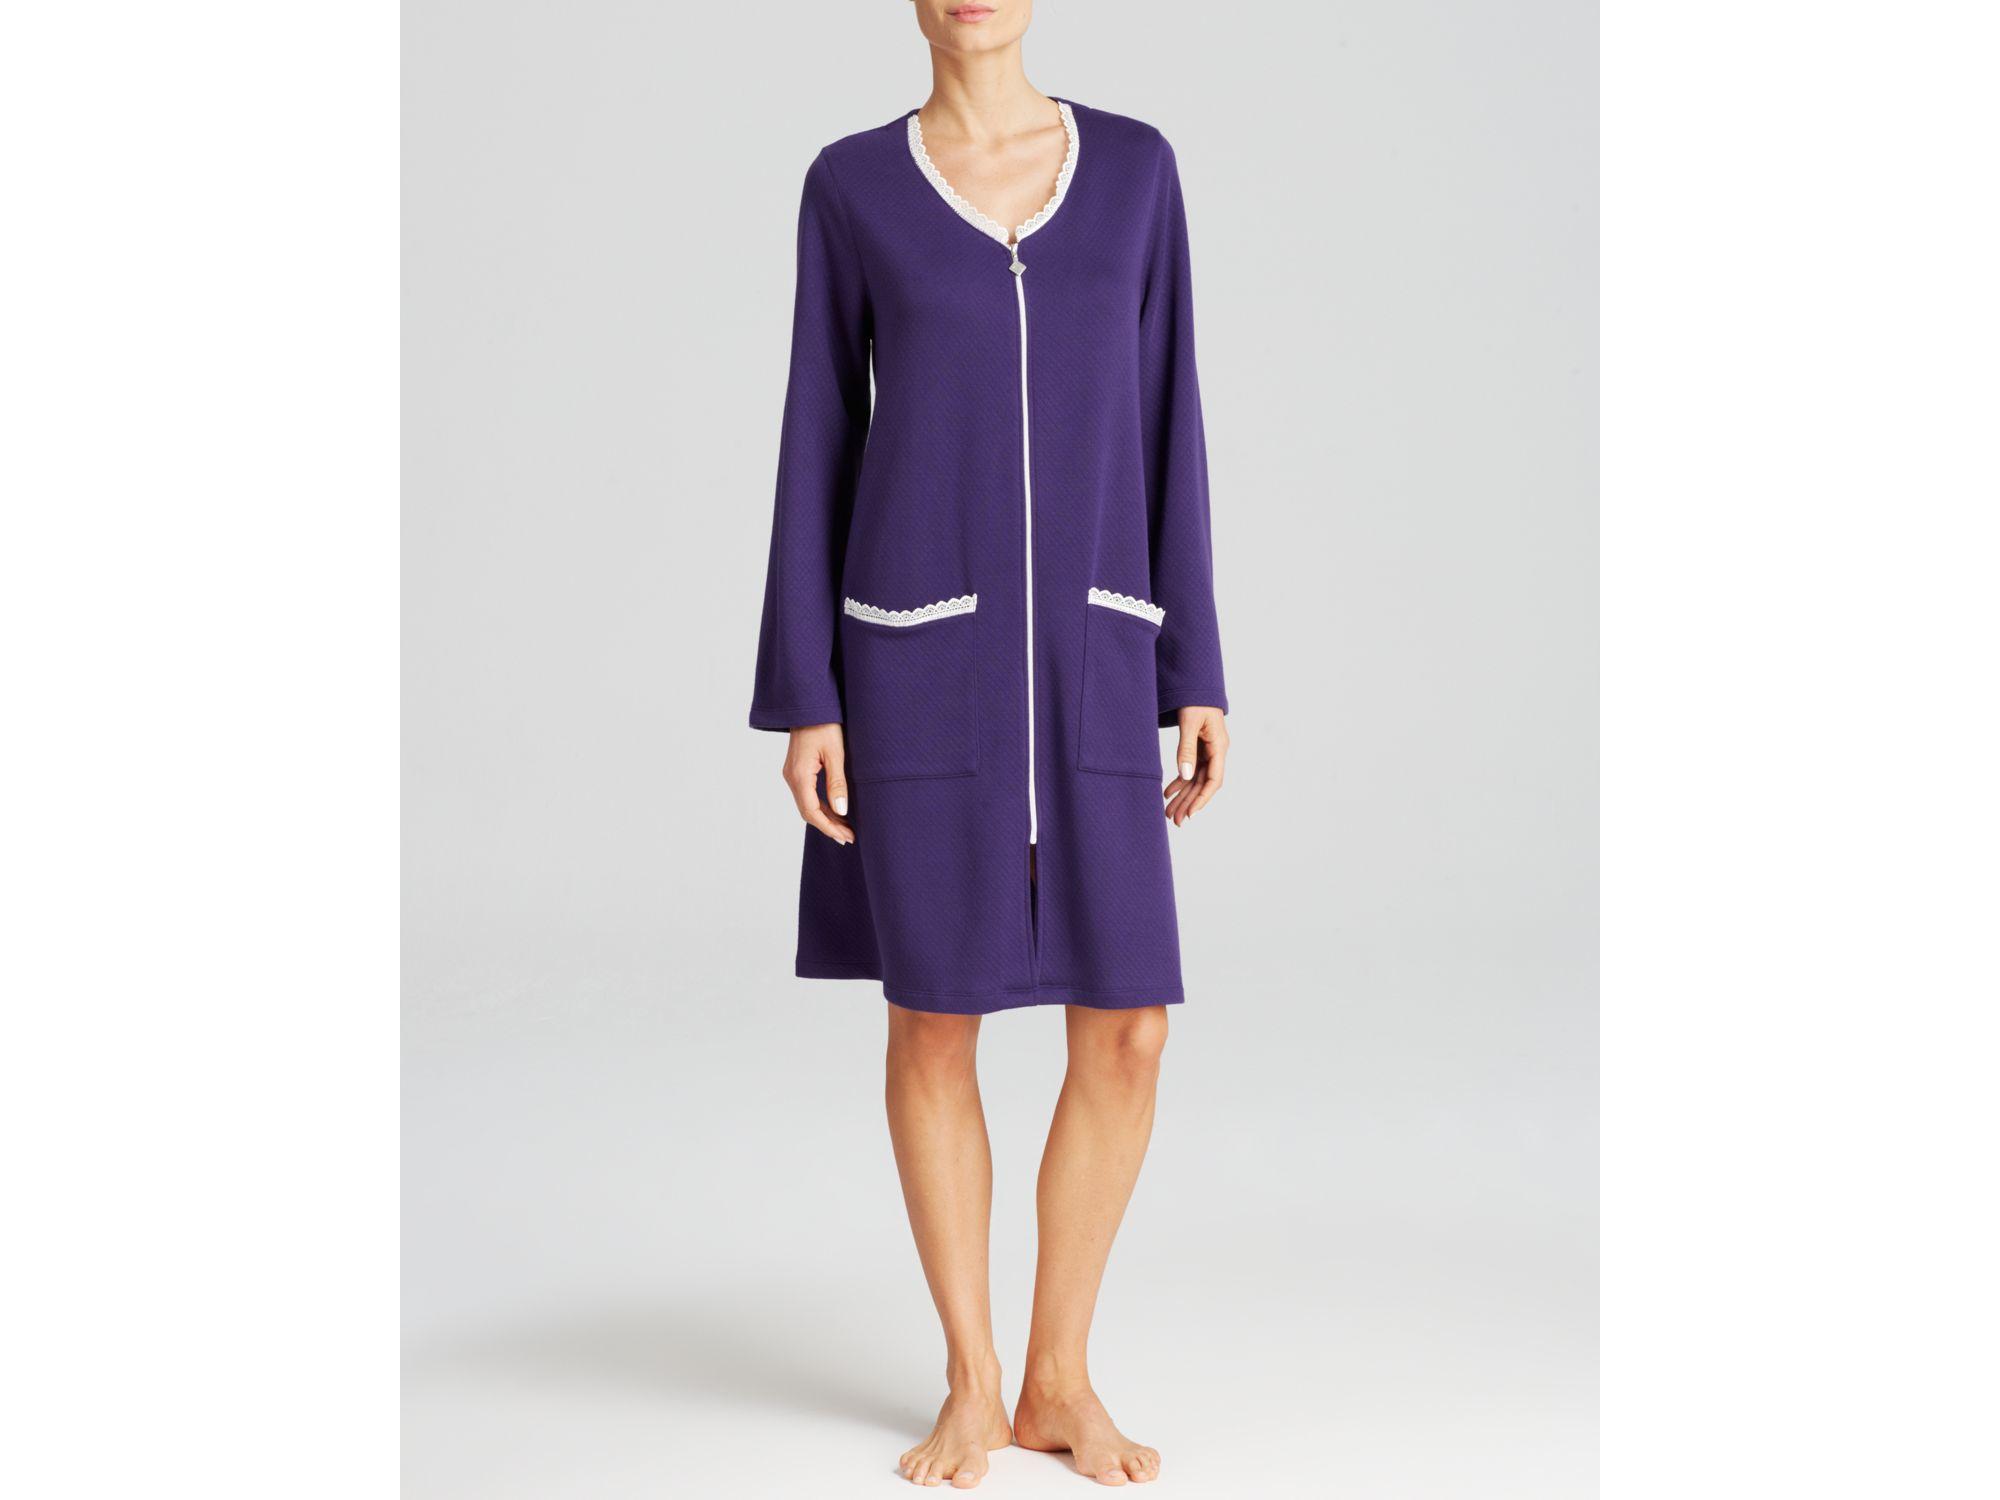 Lyst - Eileen West Milano Short Zip Robe in Purple ceb7195ed